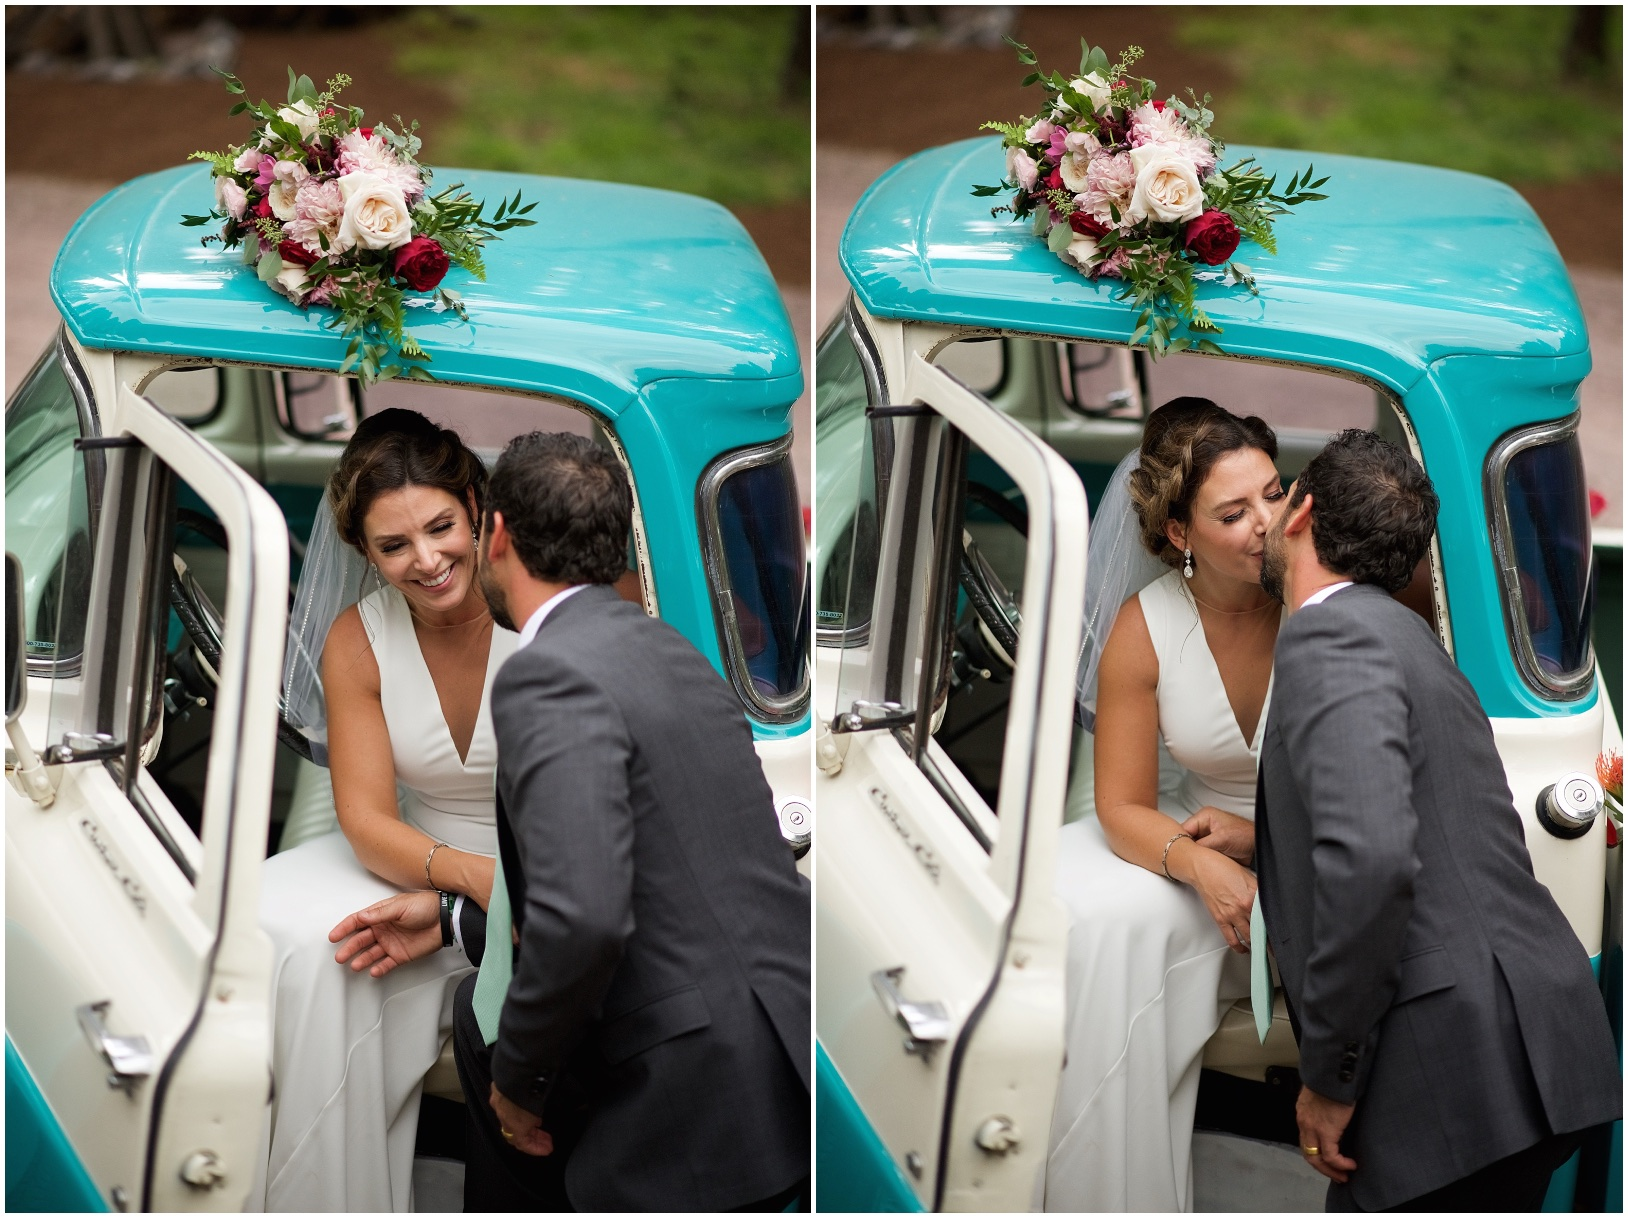 lindseyjane_wedding091.jpg